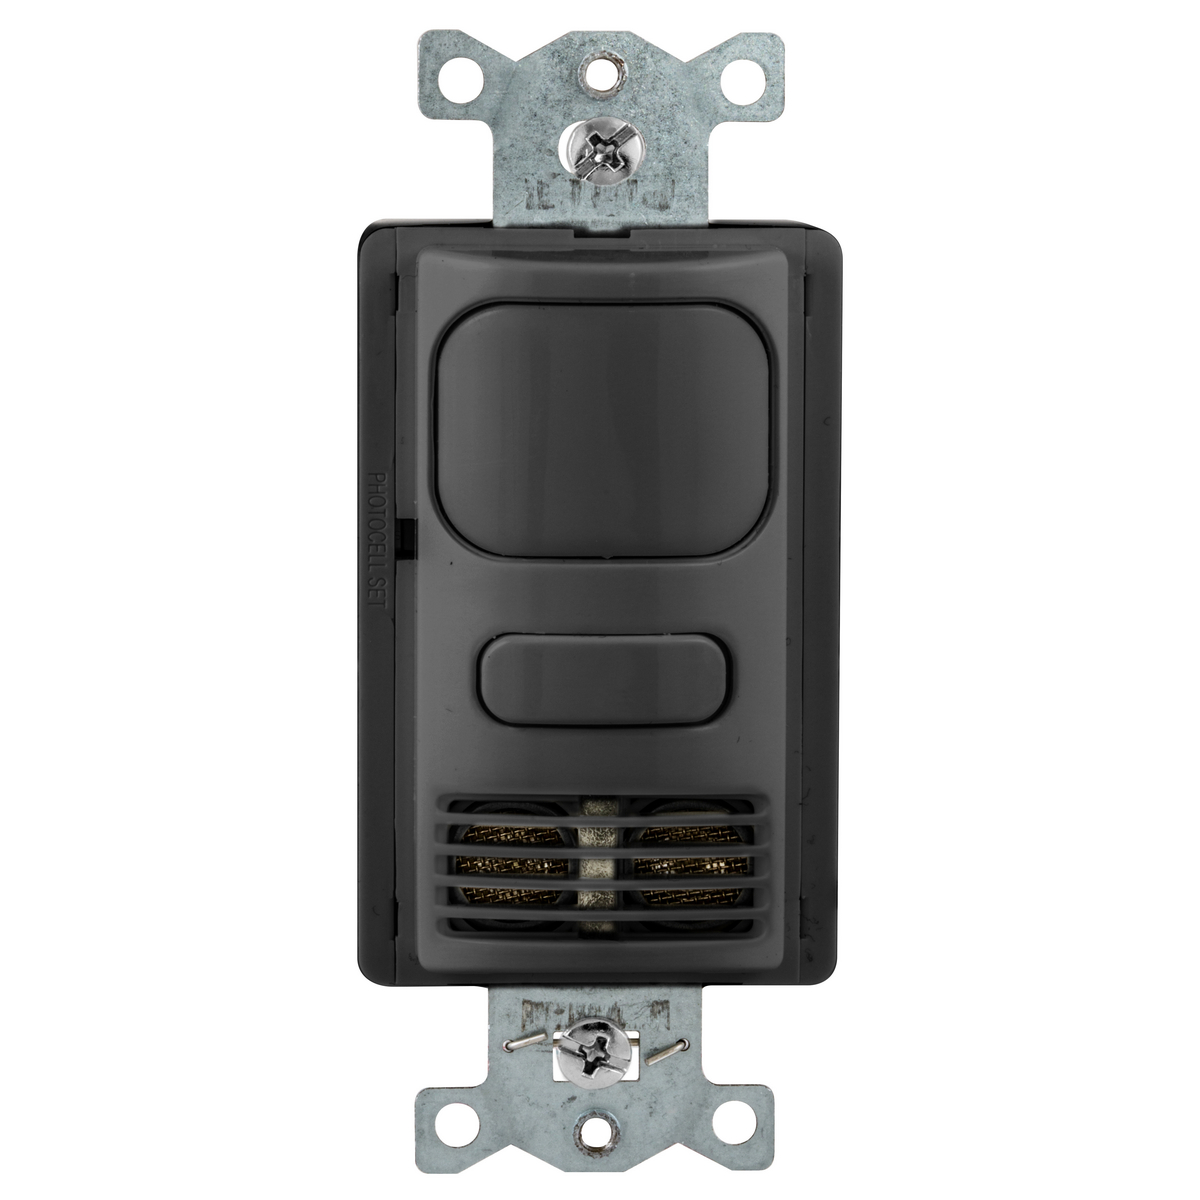 Ad2000bk1 Wall Switch Sensors Lighting Controls